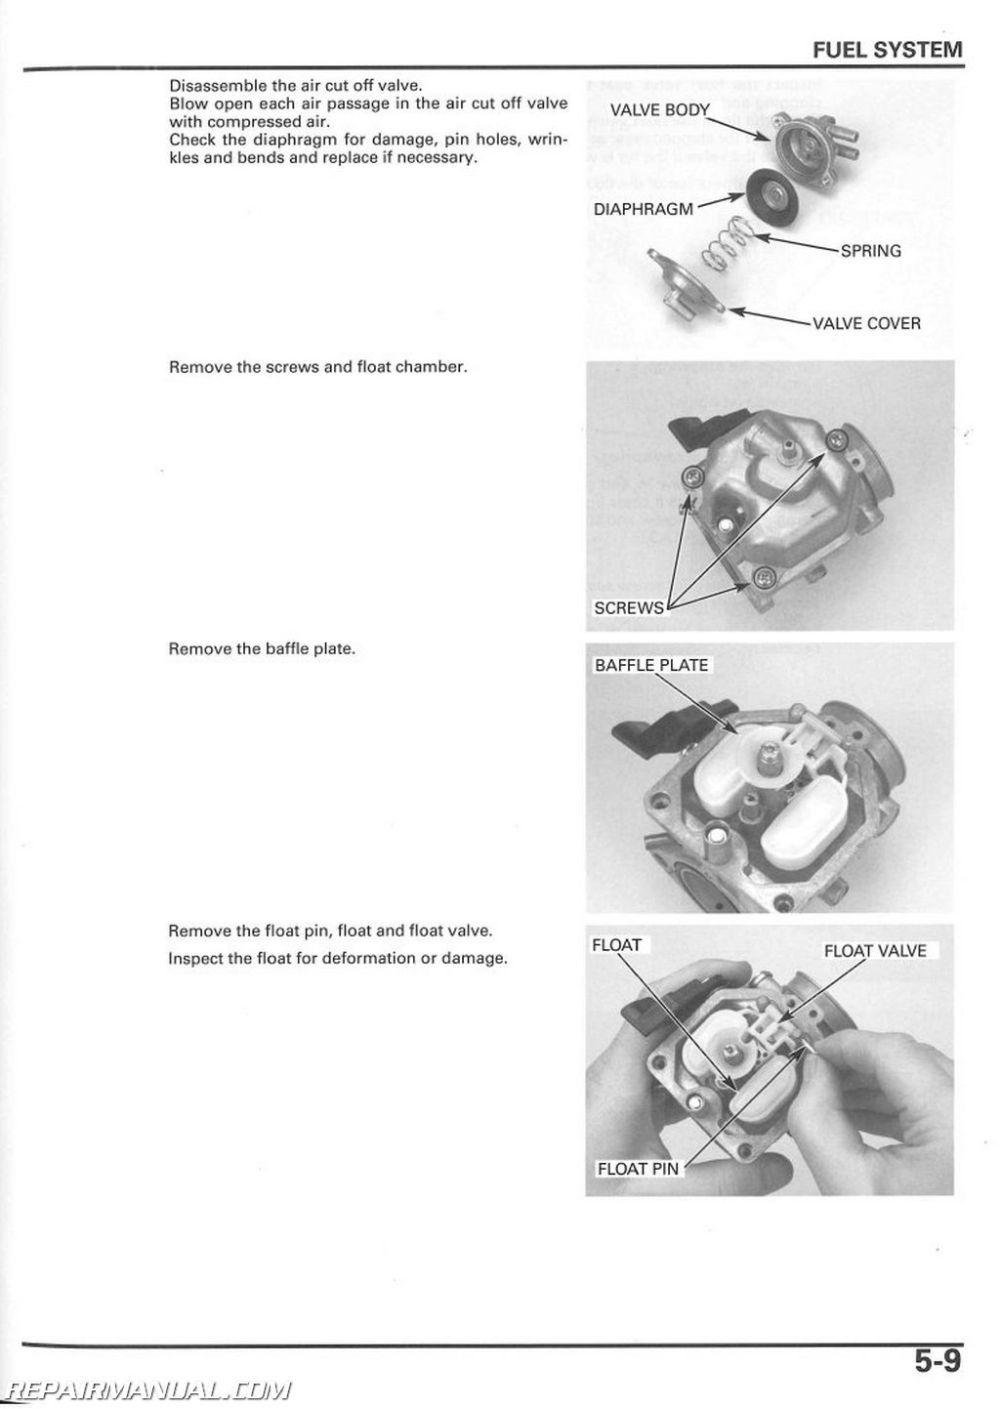 medium resolution of honda 4 track 1996 atv wiring schematic